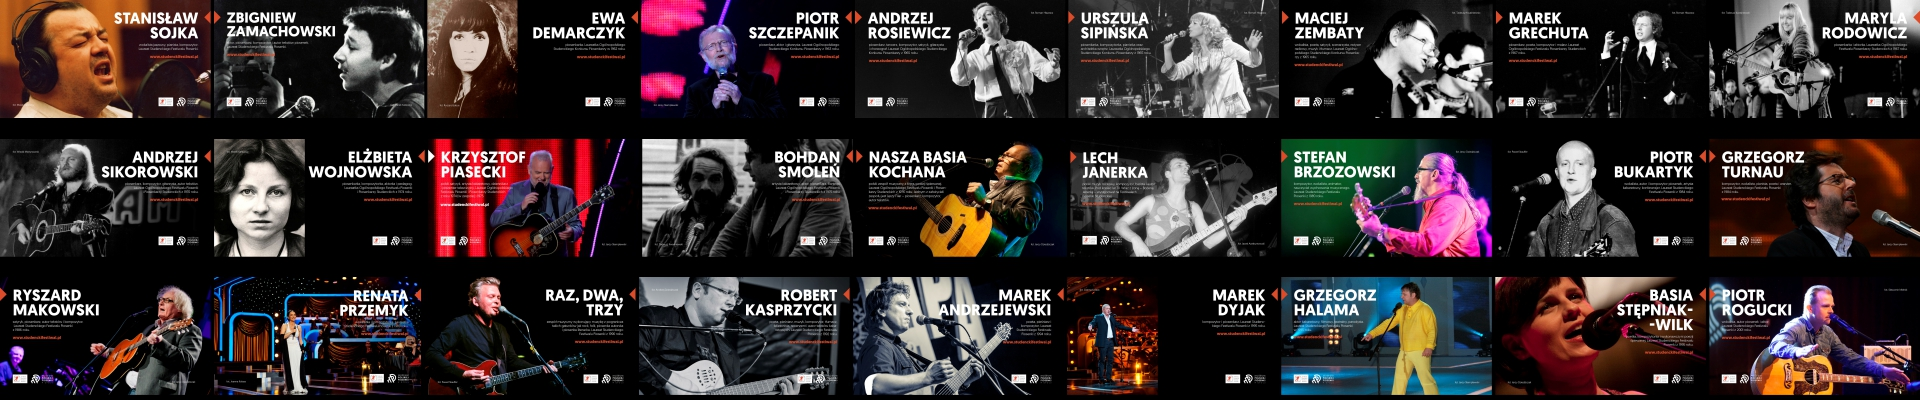 56. Studencki Festiwal Piosenki - Krakowski Festiwal Piosenki